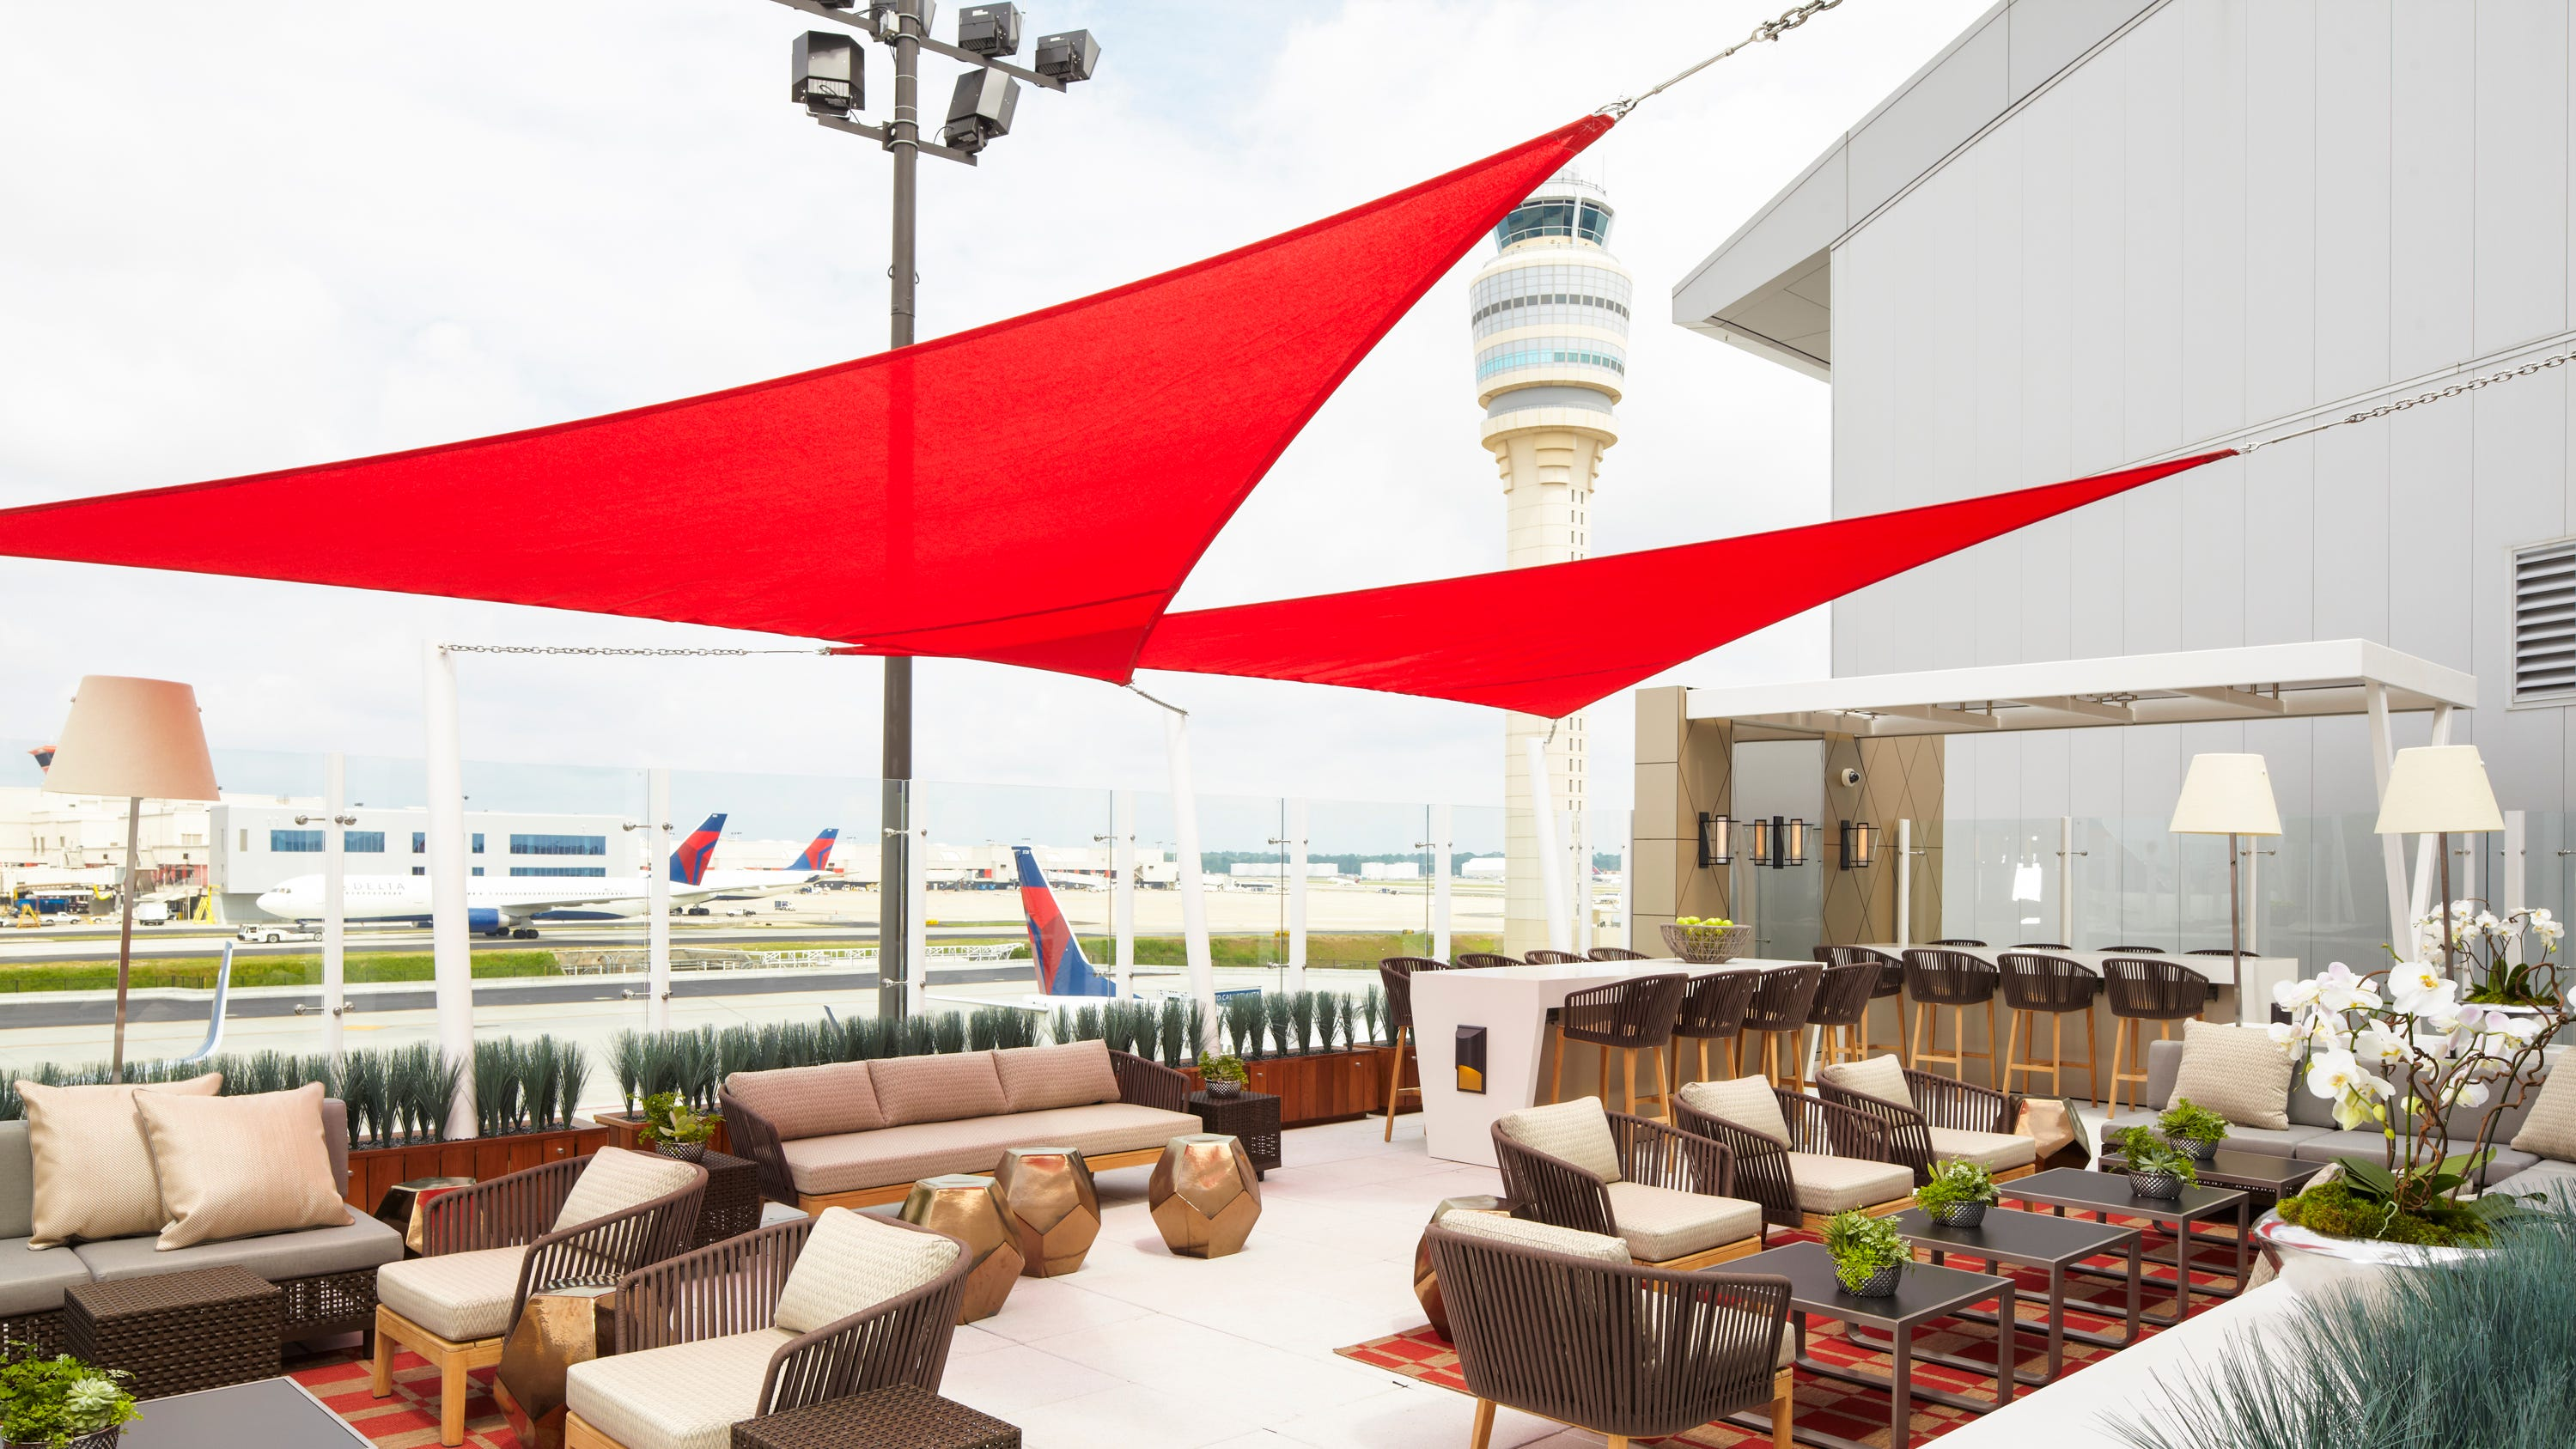 The deck at the Delta Sky Club at Hartsfield-Jackson Atlanta International Airport.